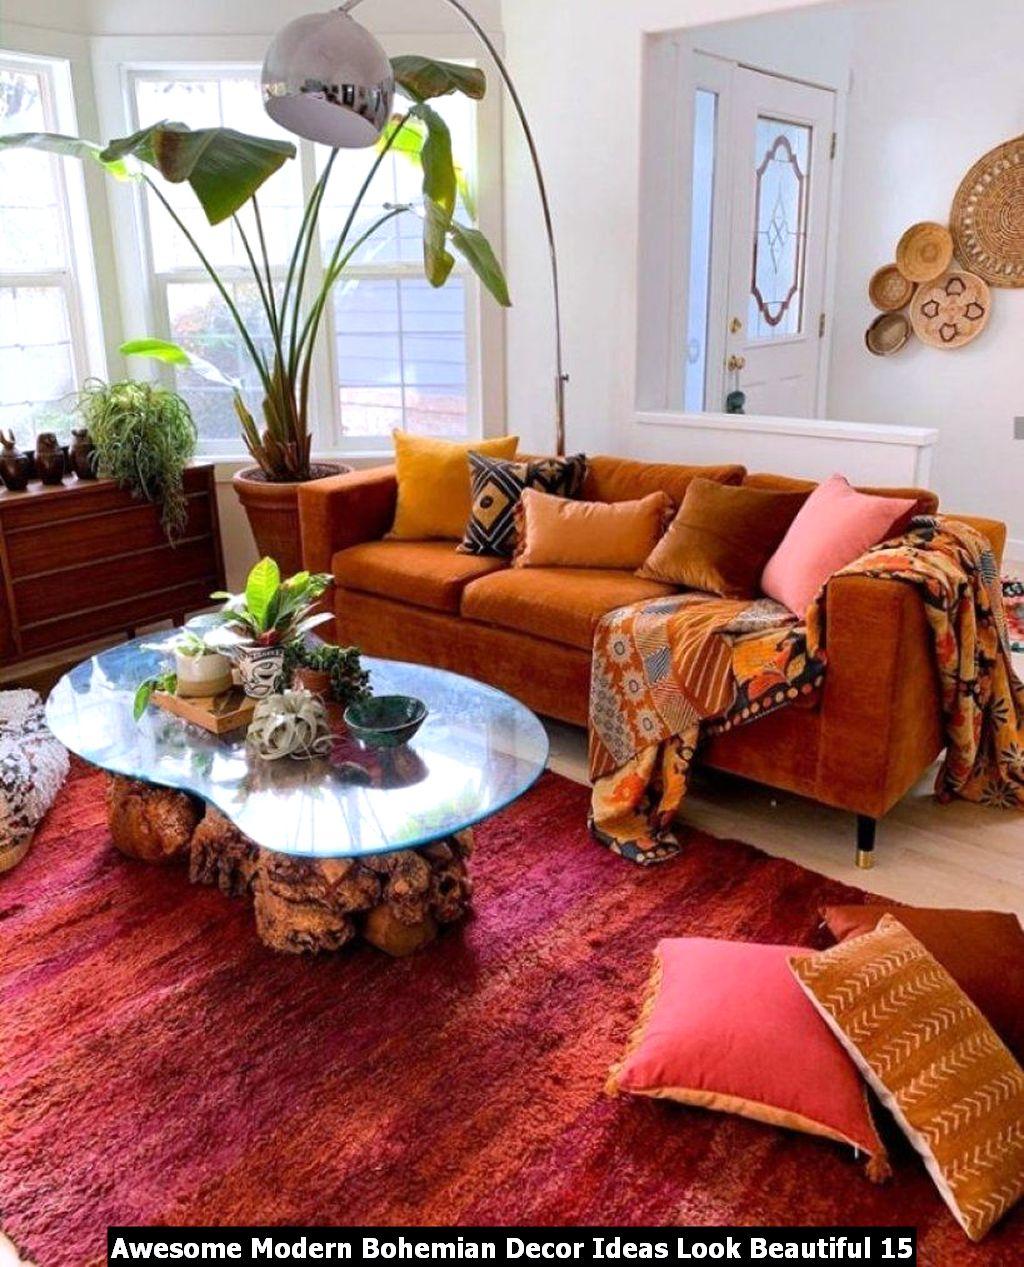 Awesome Modern Bohemian Decor Ideas Look Beautiful 15